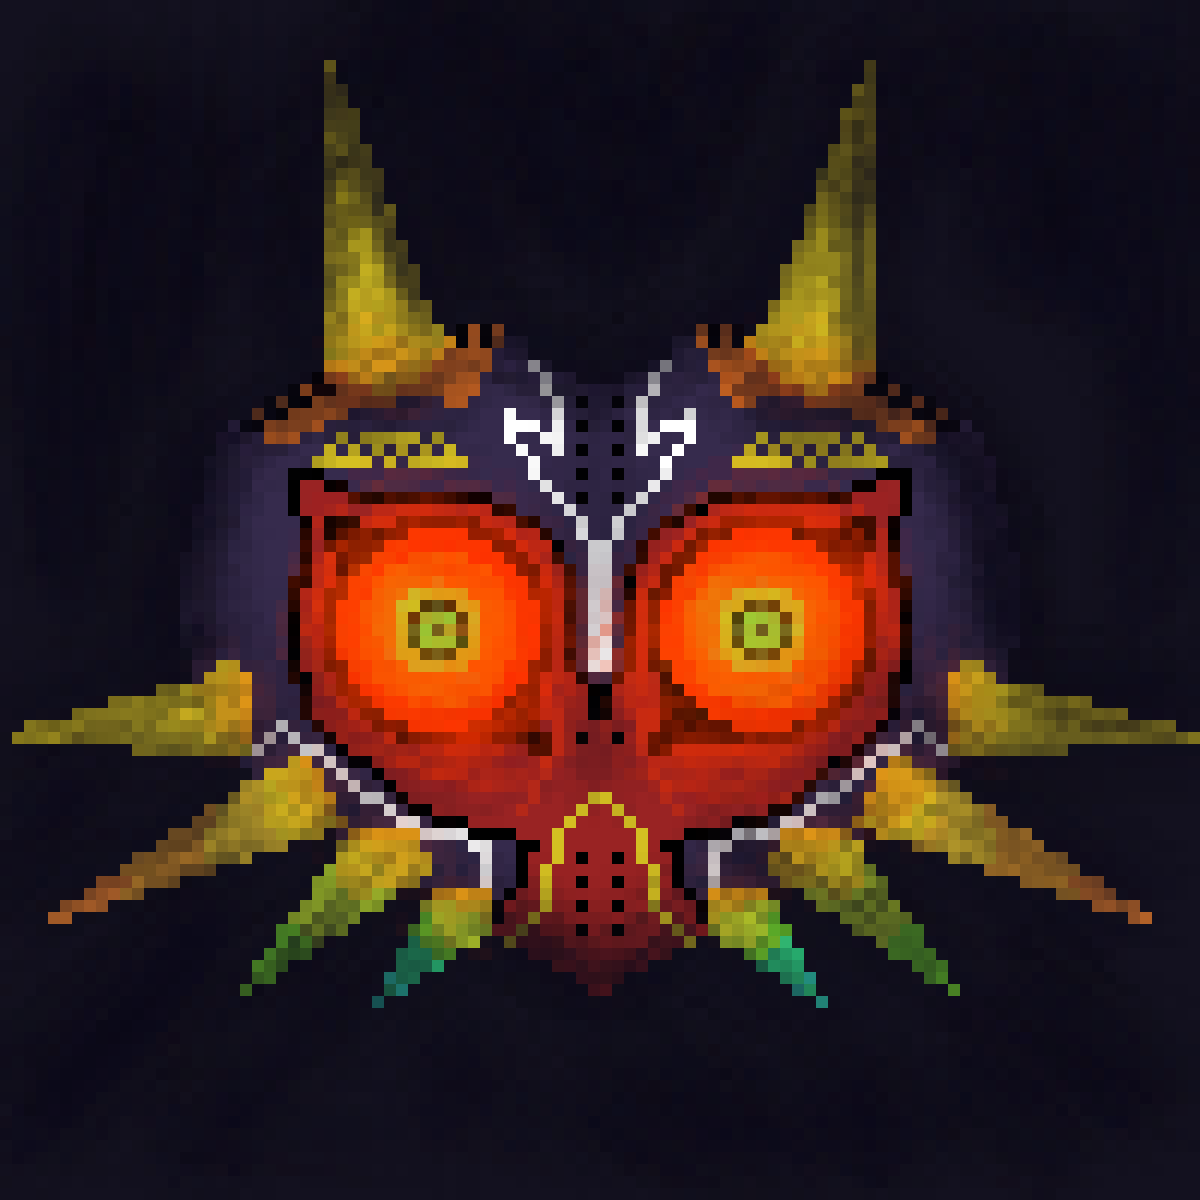 Majora's Mask by ScatteredLeaves